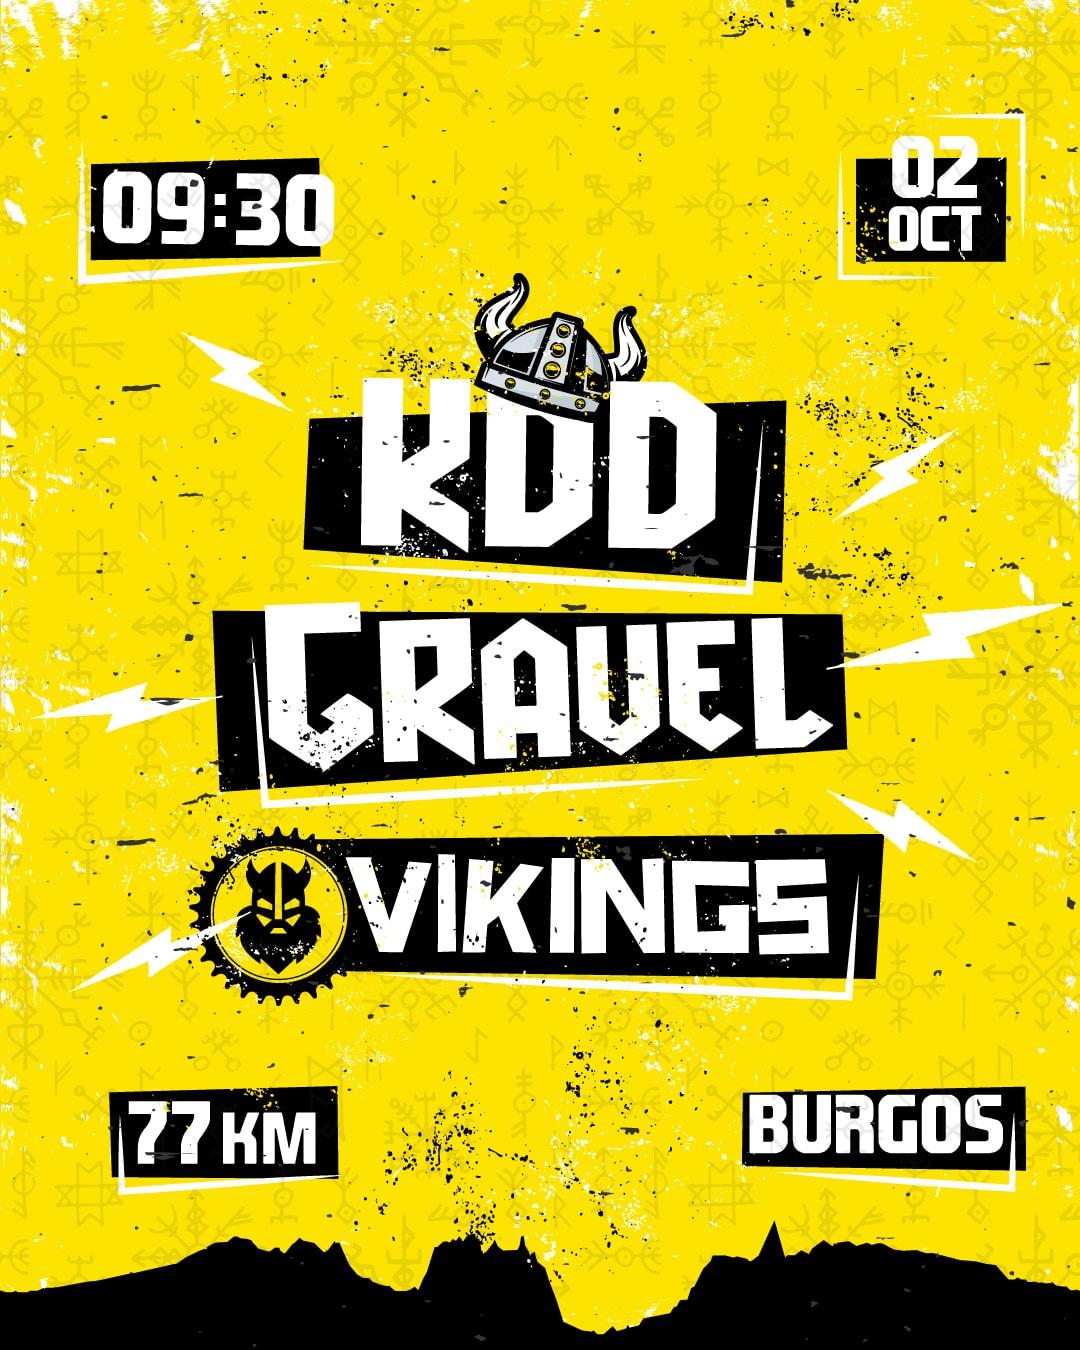 vikings burgos gravel